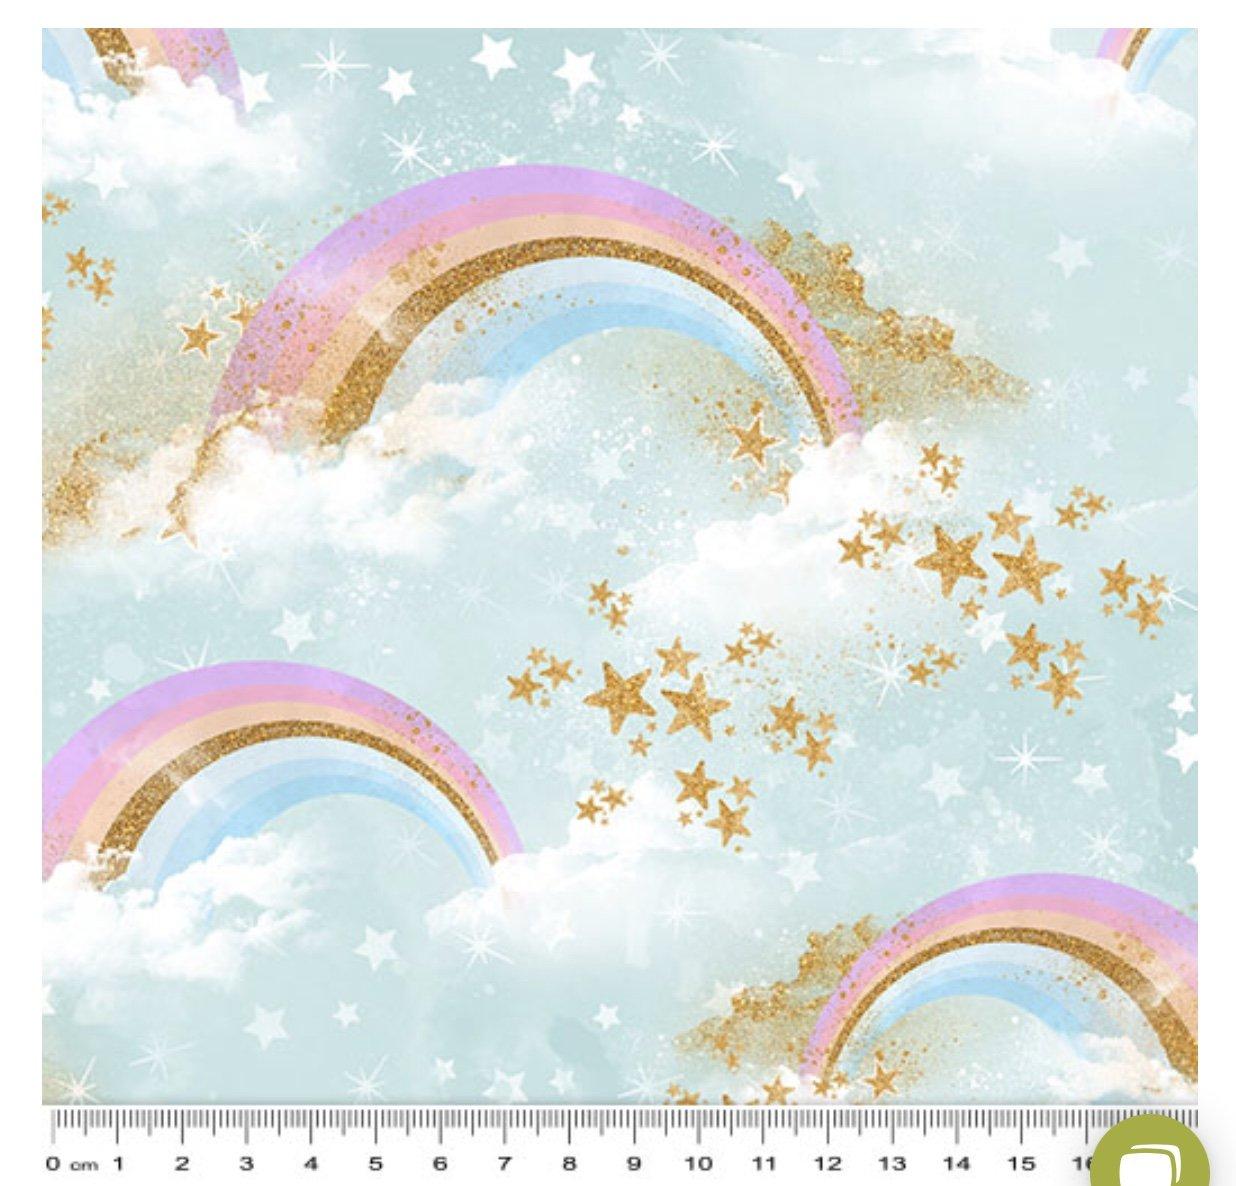 Rainbow Unicorn clouds